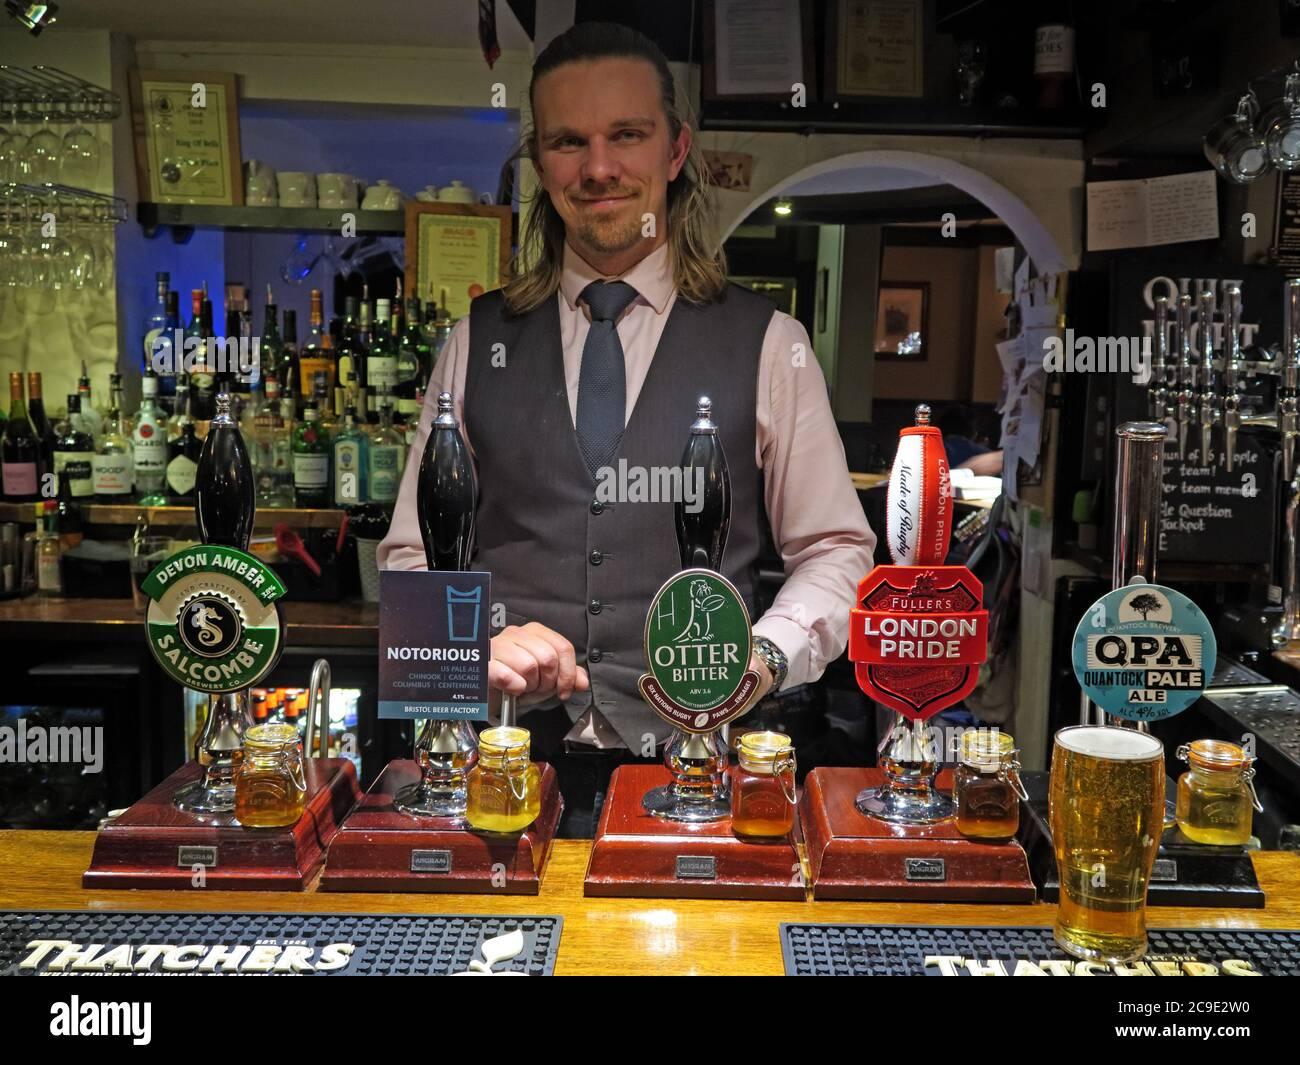 GoTonySmith,HotpixUK,@HotpixUK,England,UK,British,Great Britain,CAMRA,real ale,real ale bar,pump,pumps,real ale pumps,boozer,boozers,cask,ale,Devon Amber,Salcombe,Thatchers,Notorious,Otter Bitter,London Pride,QPA,Quantock Pale,IPA,barman,beard